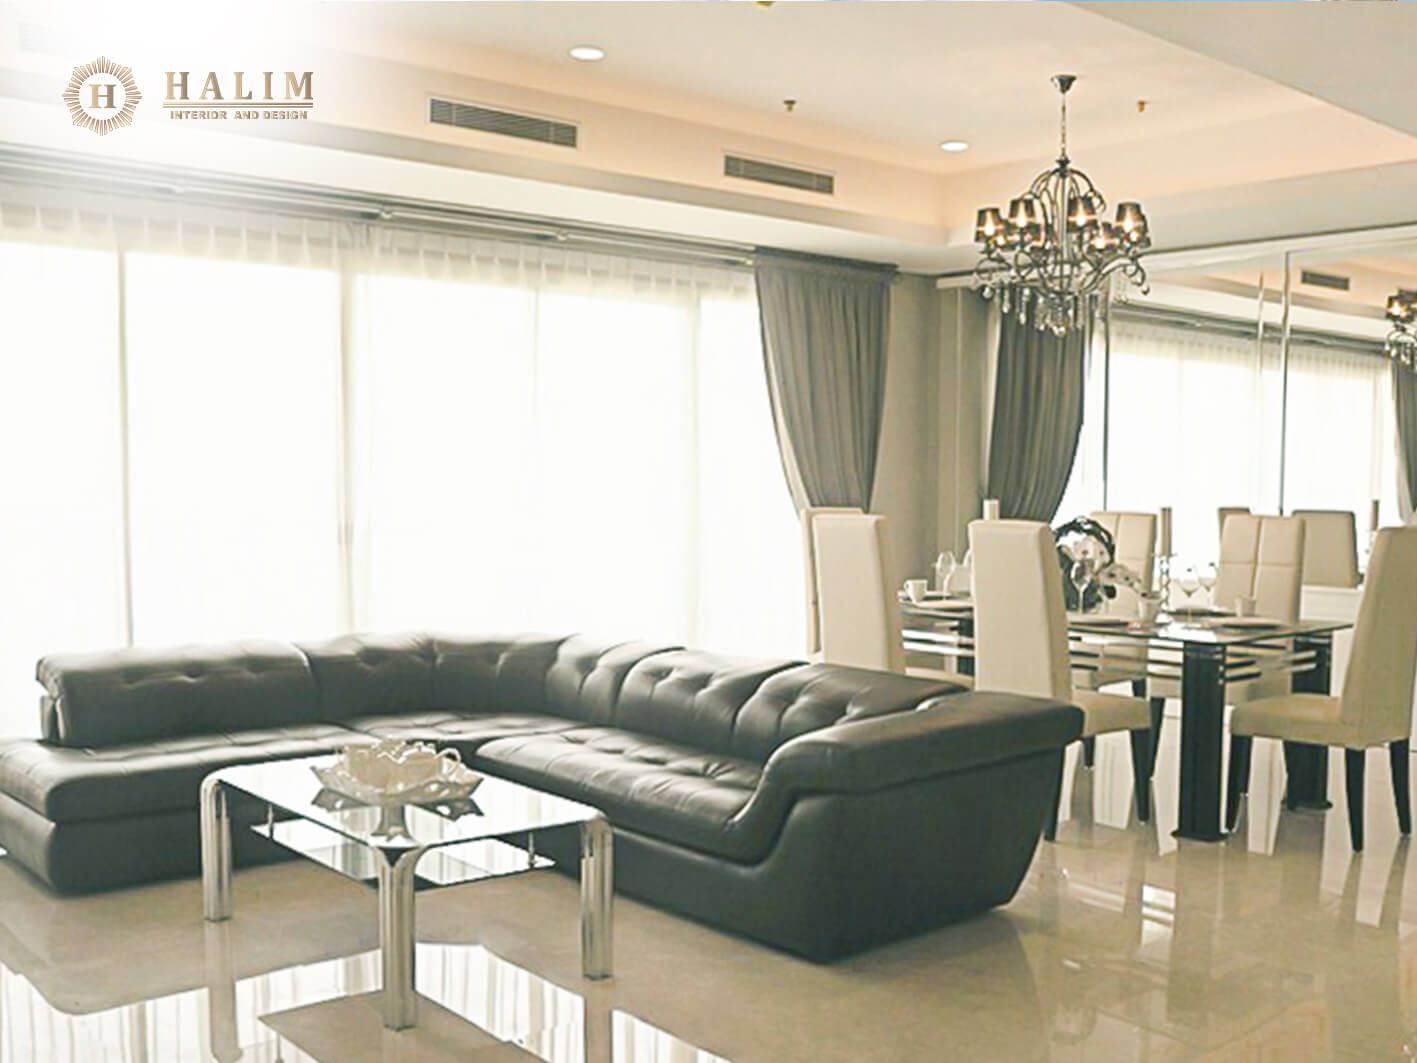 Halim, Interior, modern, furniture, contemporer american style, minimalist, european, classic, surabaya, Lenmarc Adhiwangsa, 1a2a